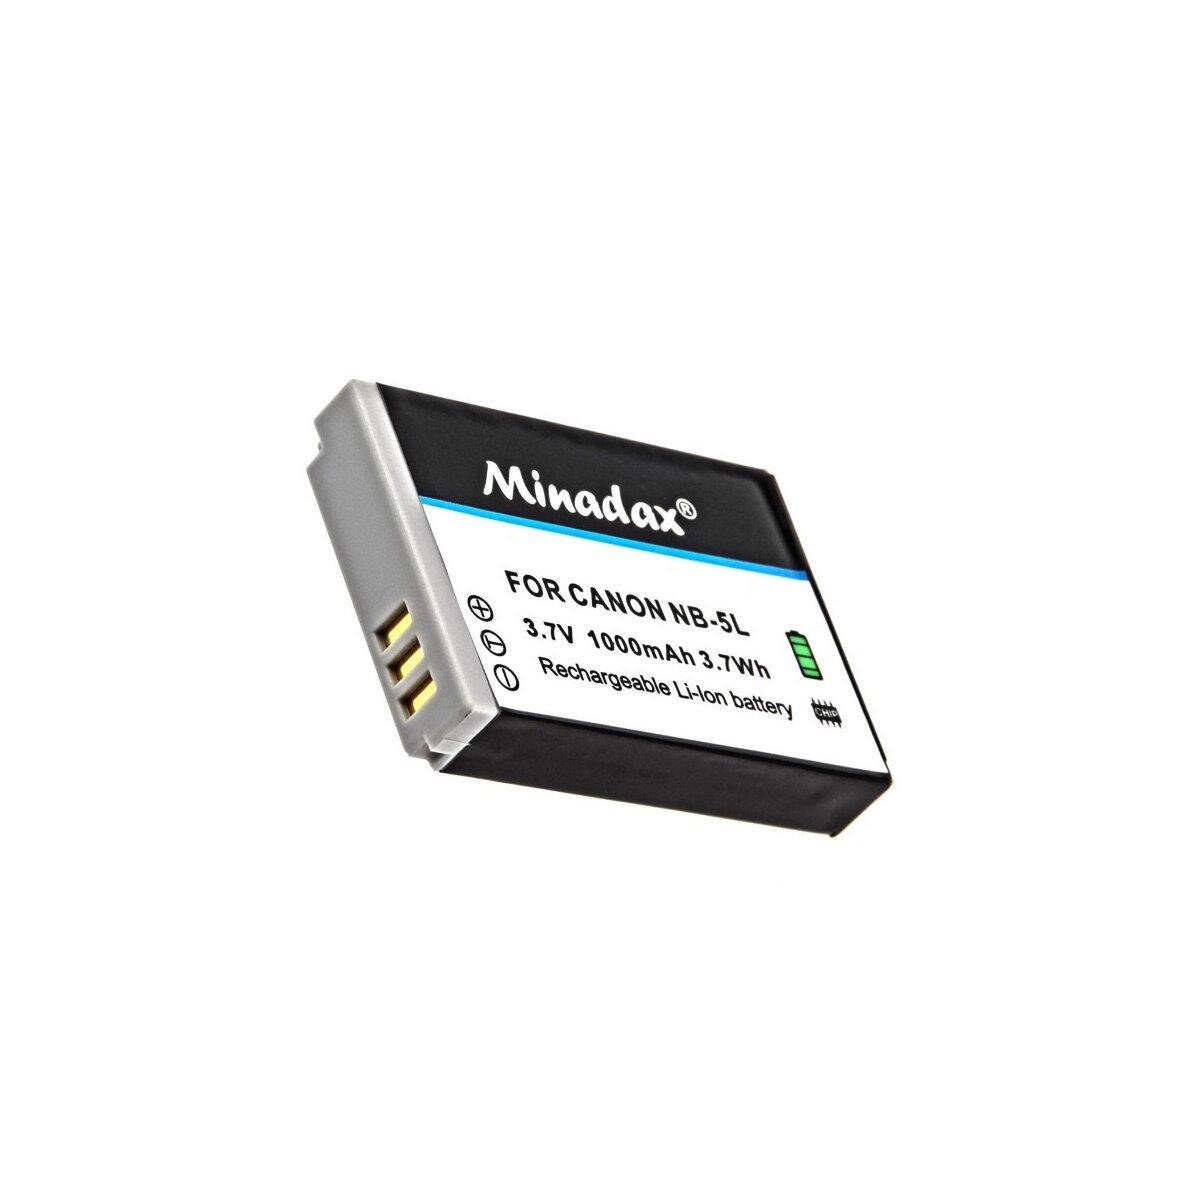 Minadax® Qualitaetsakku mit echten 1000 mAh fuer Canon Ixus 800 IS / 850 IS / 900 Ti / 950 IS, wie NB-5L - Intelligentes Akkusystem mit Chip